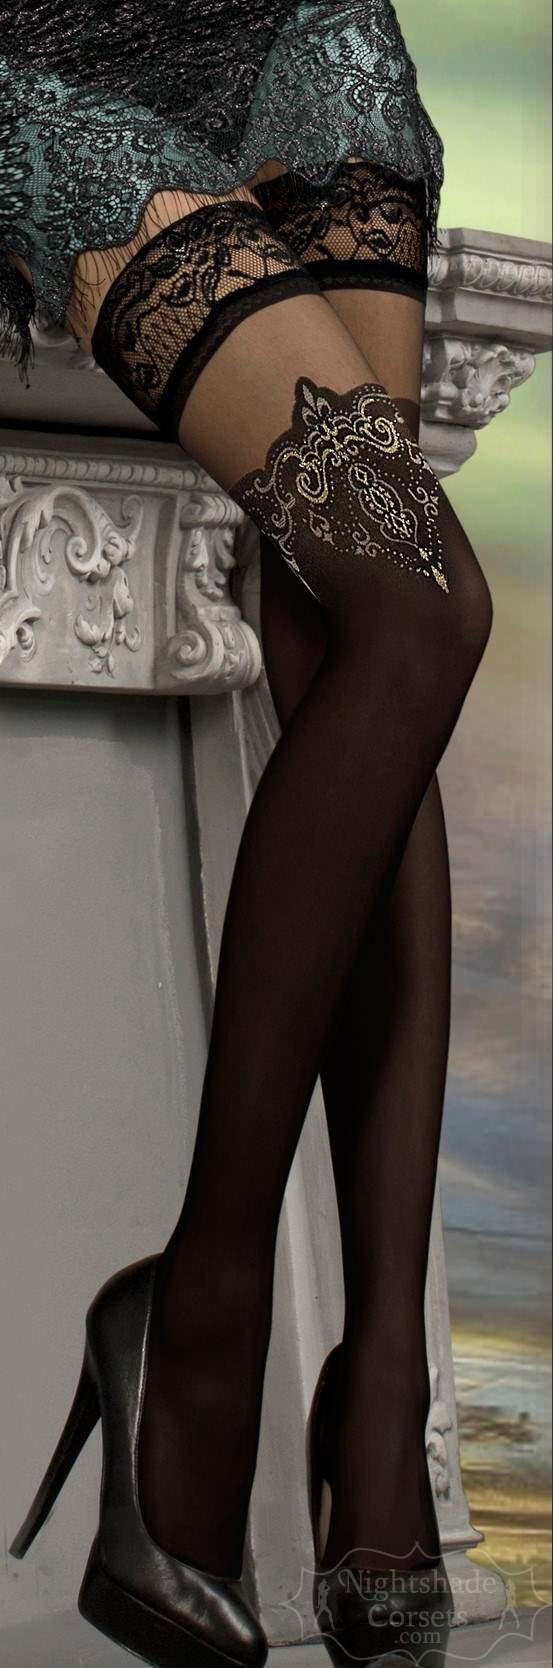 European-made stay-up stockings 0221 Edmonton